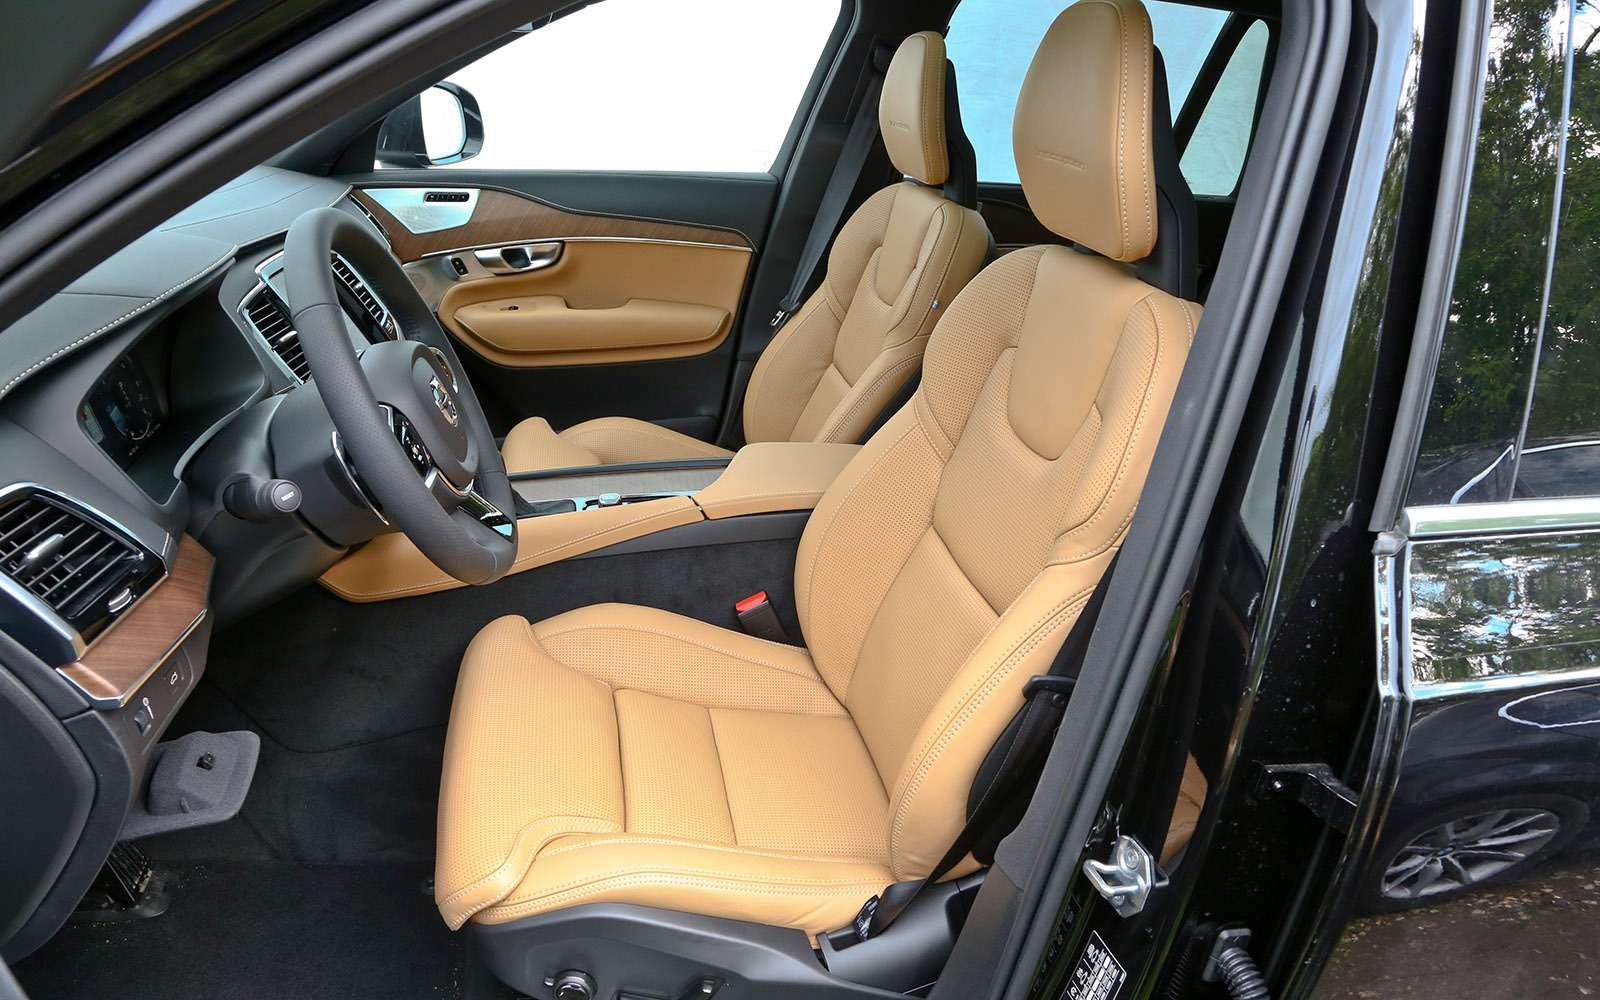 Новый Land Rover Discovery против конкурентов— тест ЗР— фото 784700